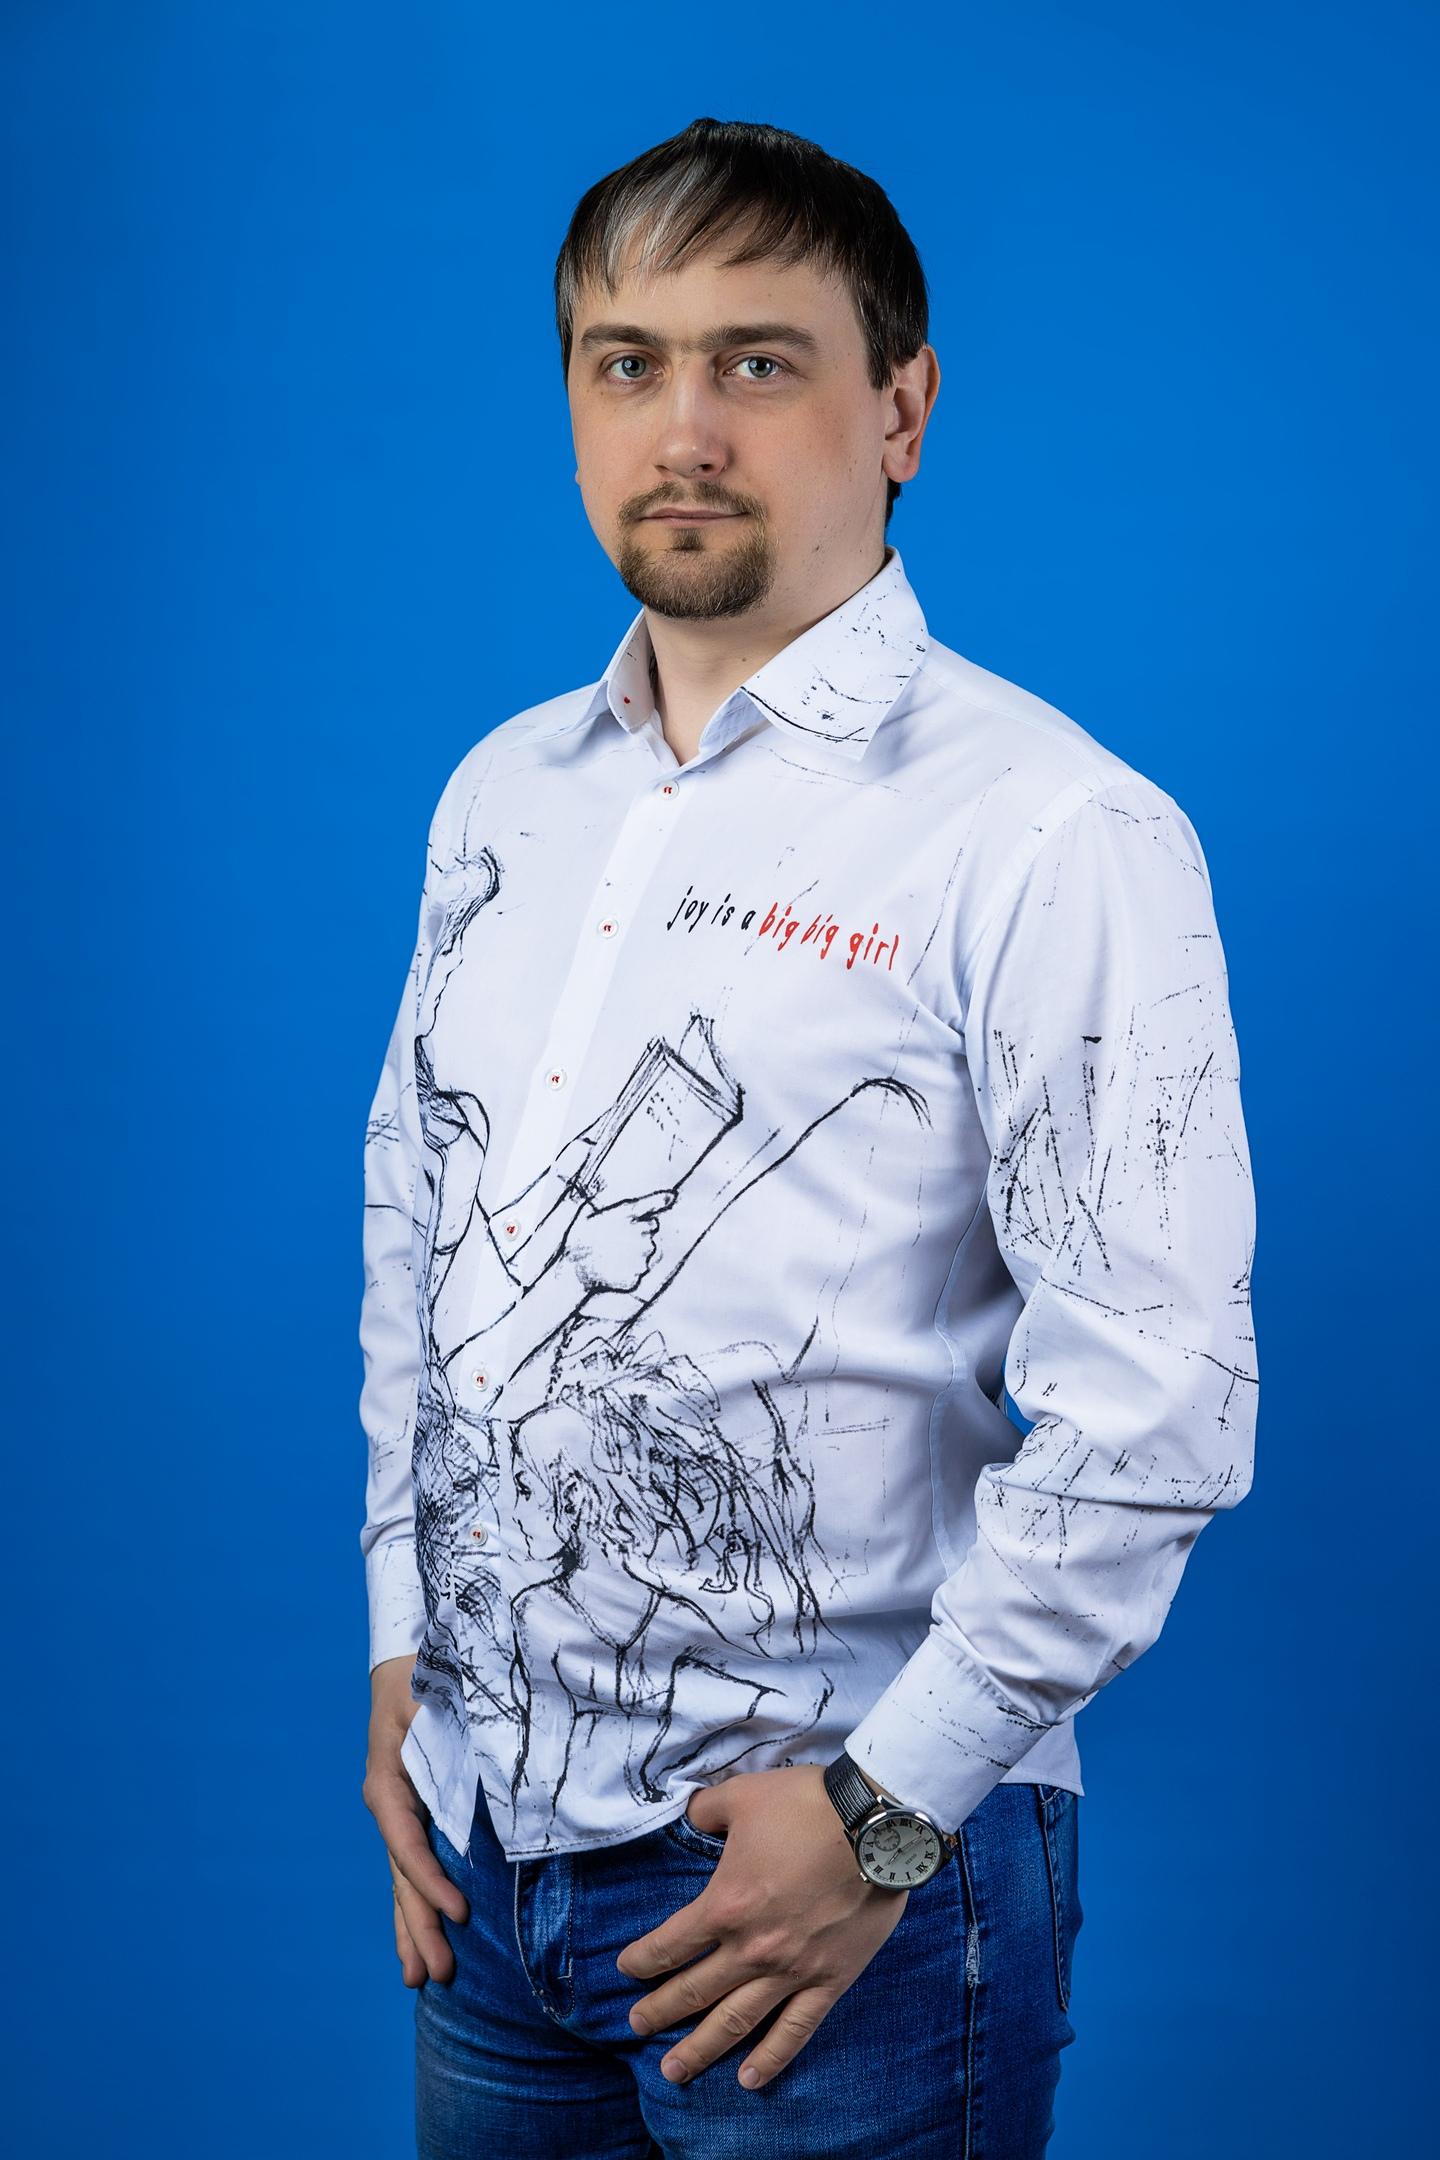 Андрей Дягилев